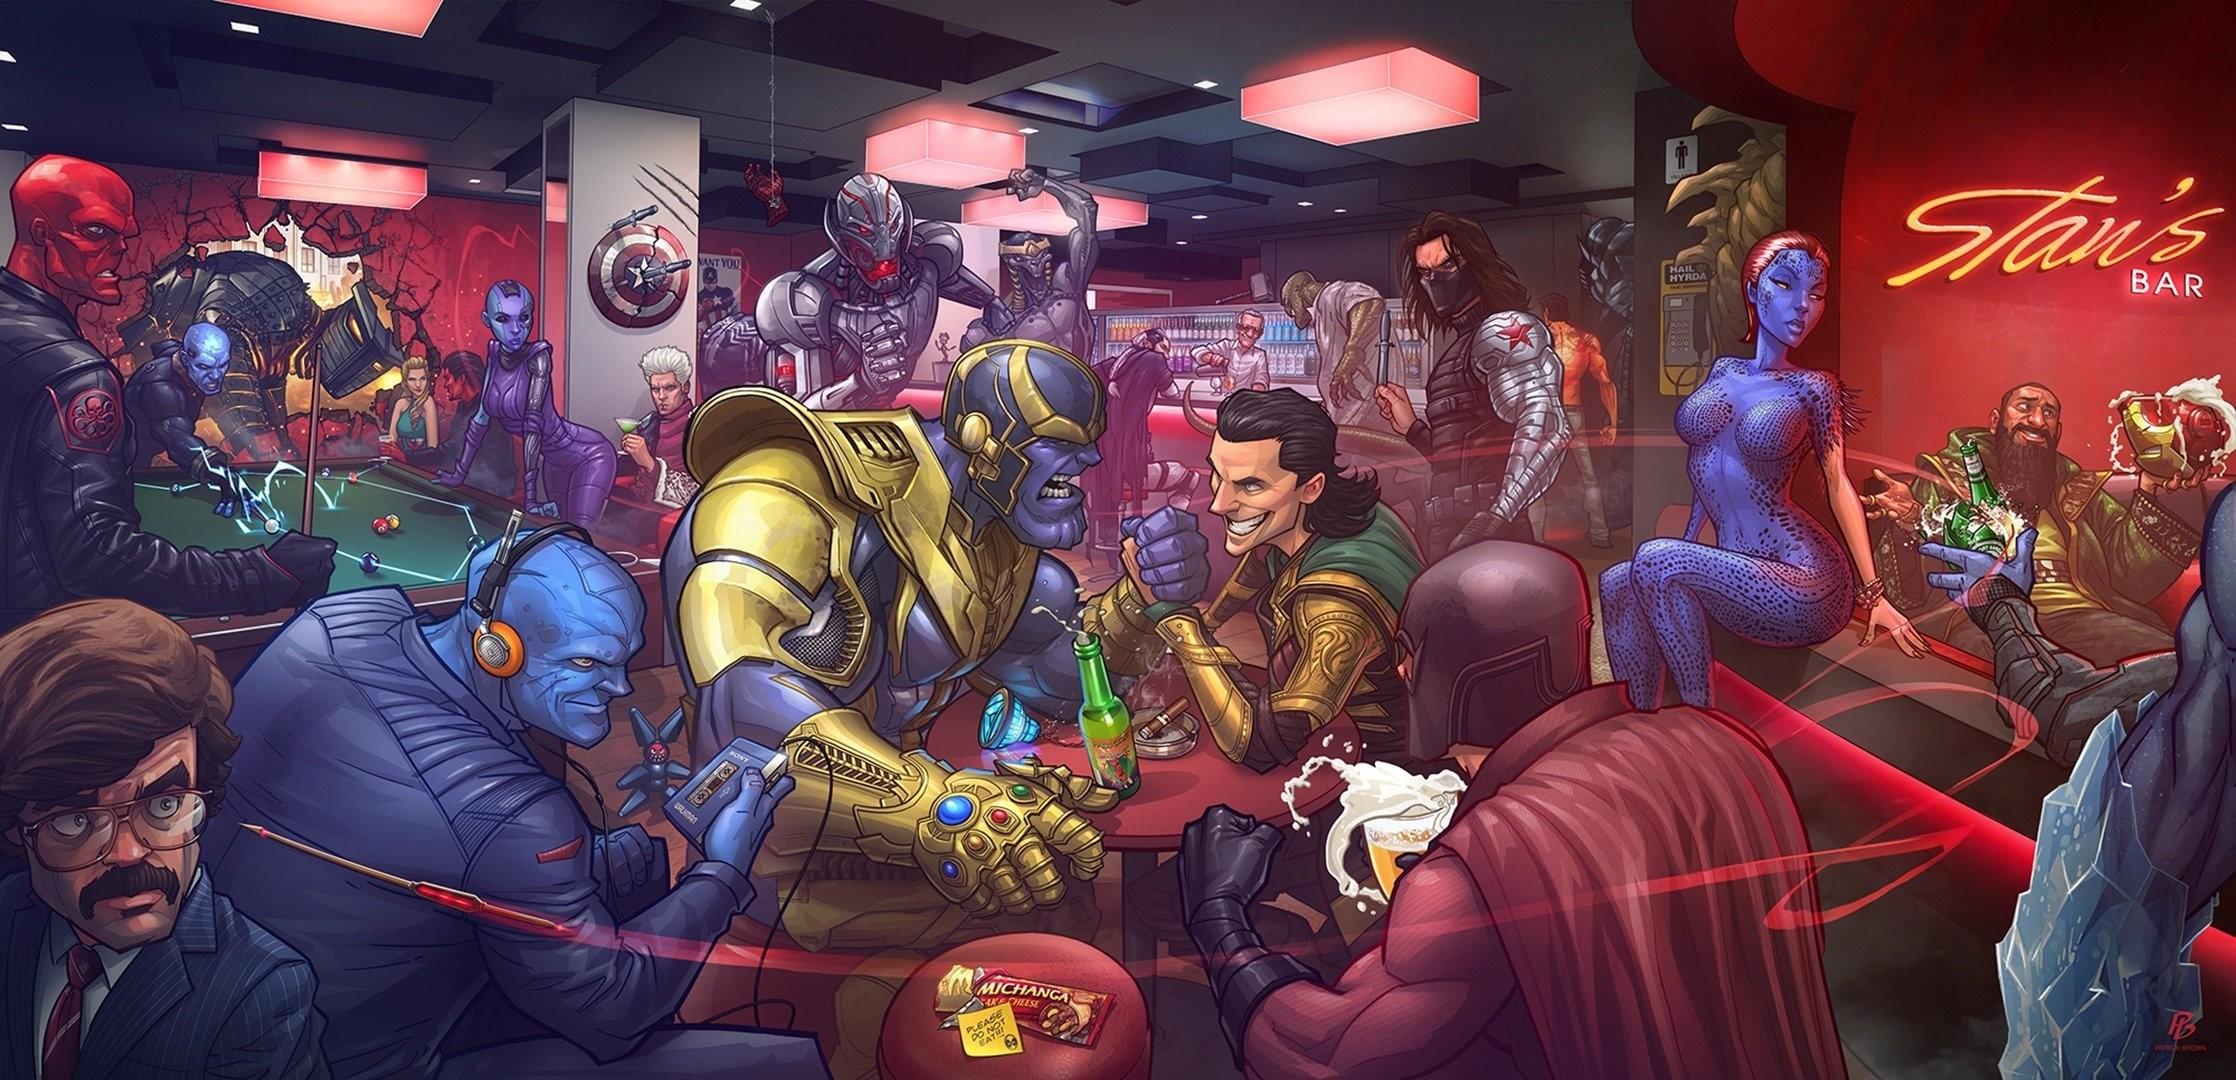 marvel comics winter soldier loki ultron magneto villains mystique x-men  johann shmidt red skull